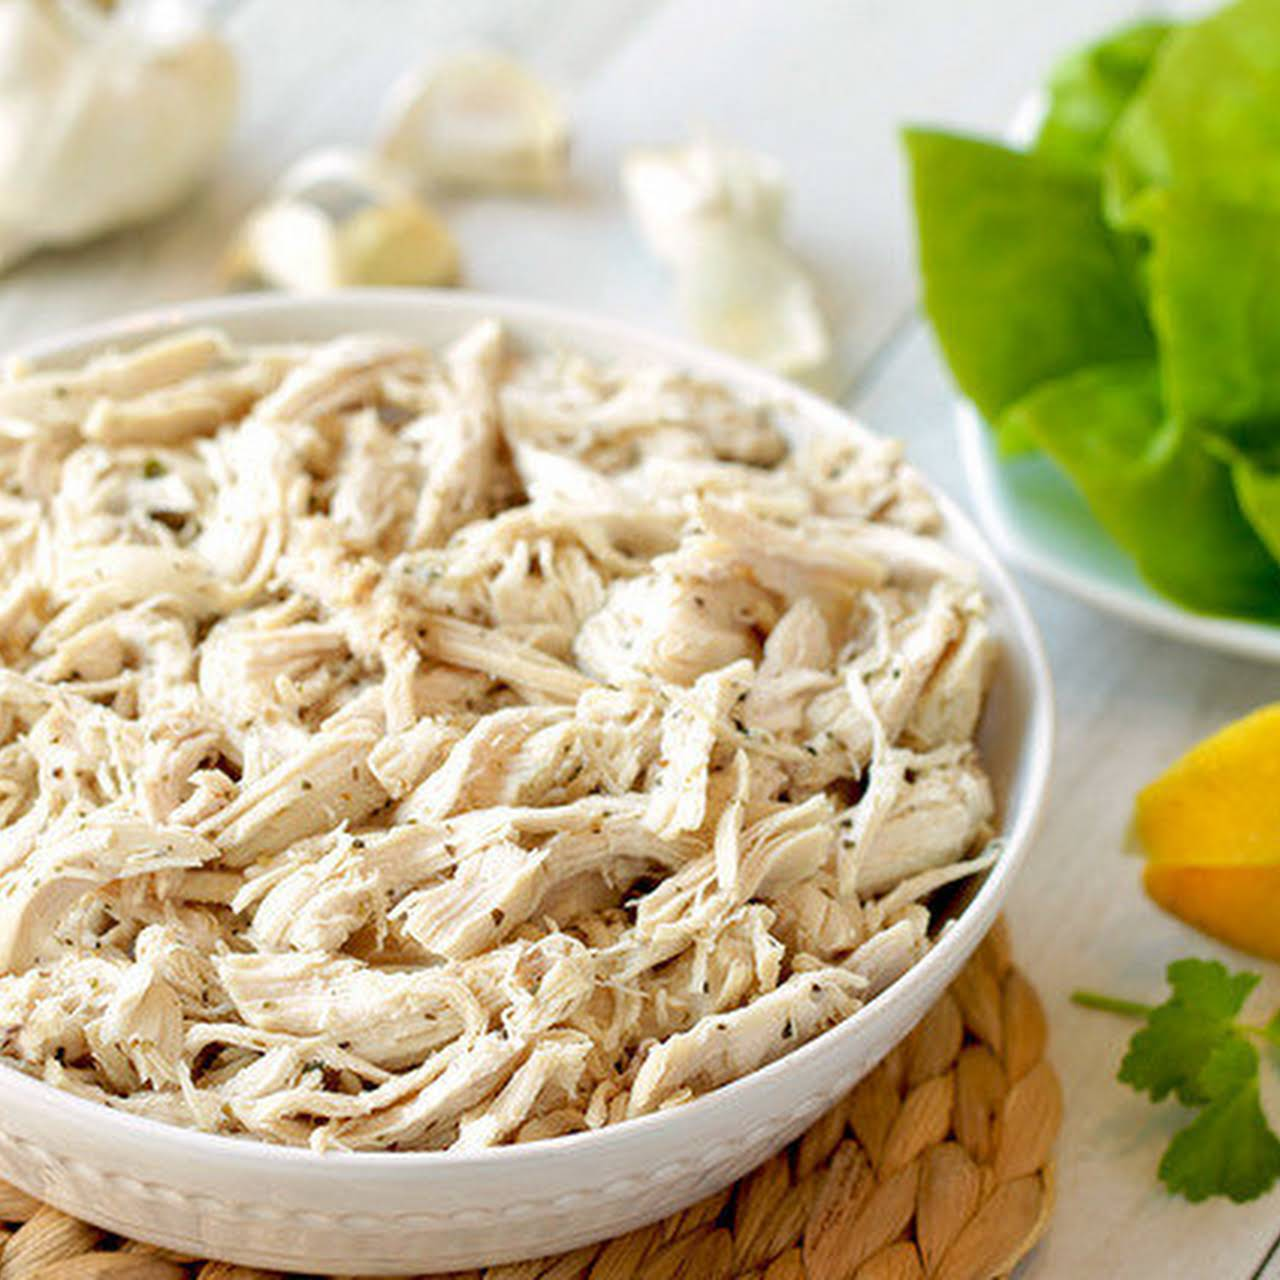 Go-to Garlic and Herb Shredded Chicken